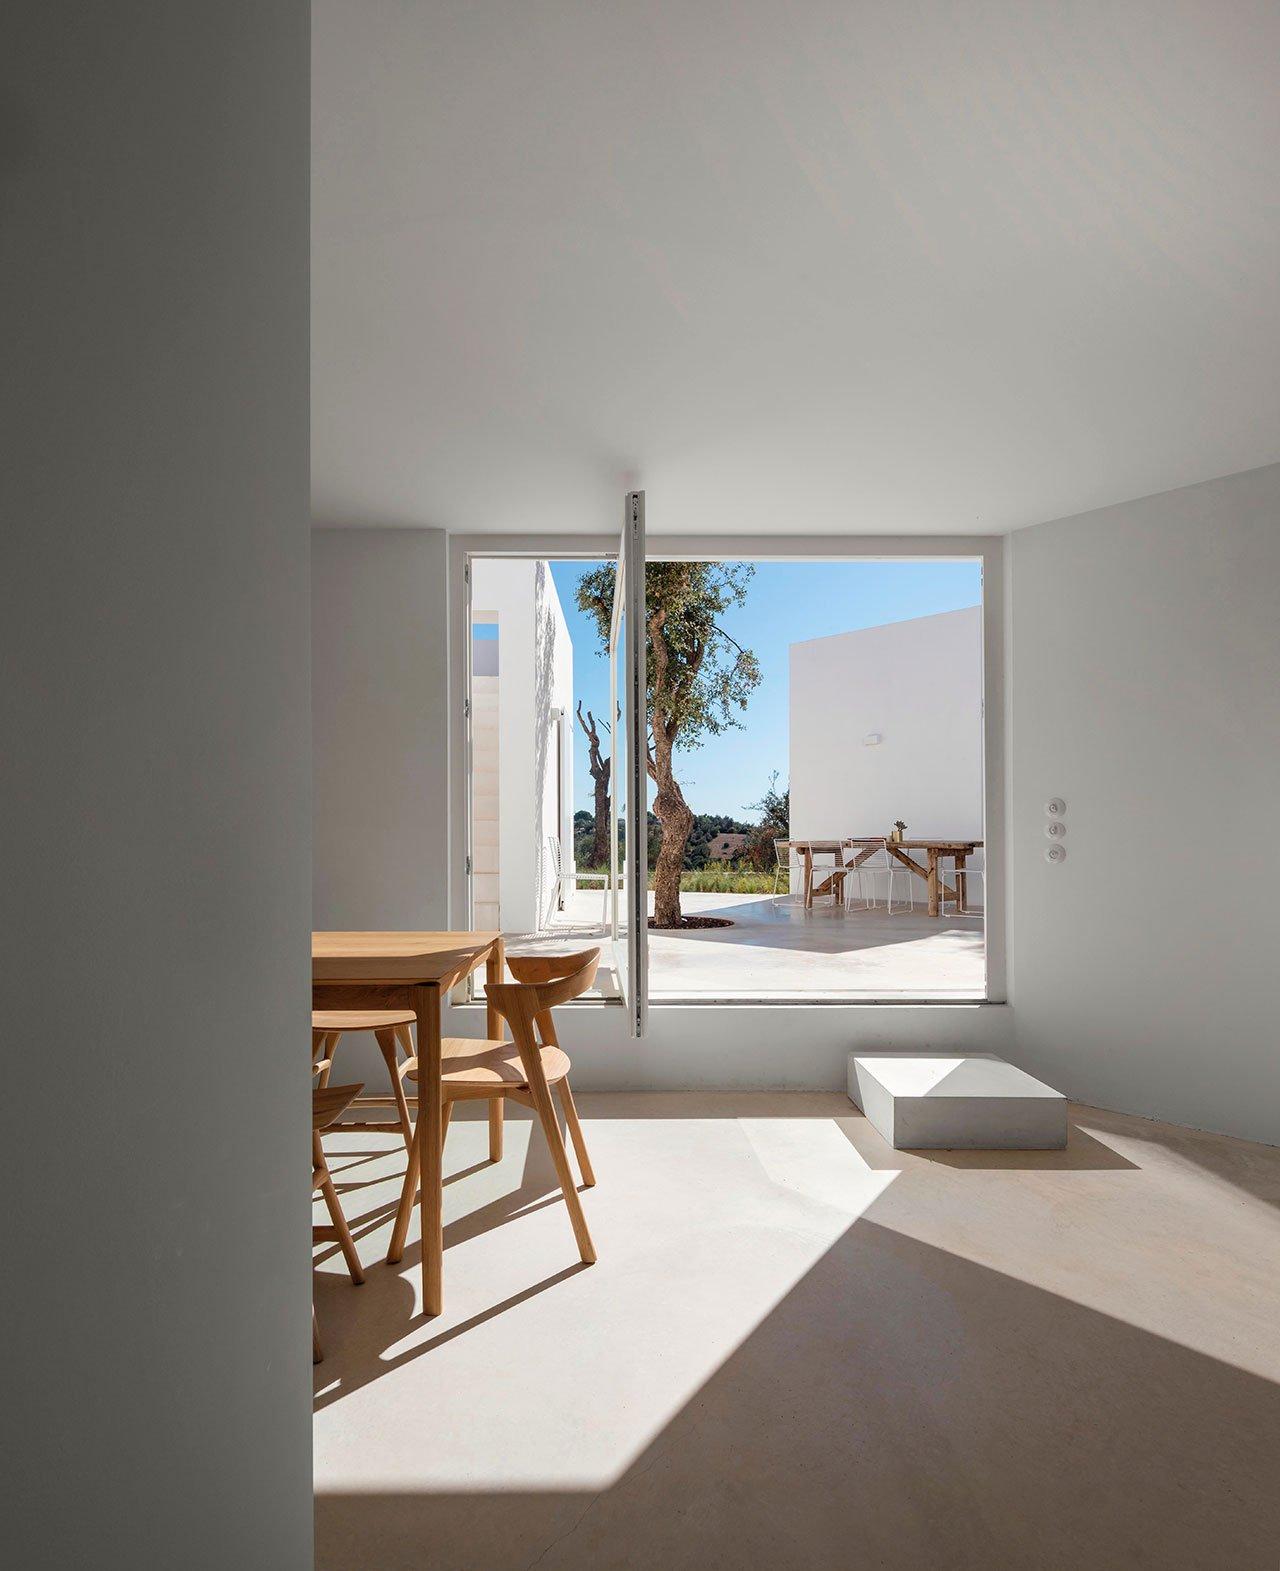 casa-luum-minimalizmus-a-portugal-videken-noko-026.jpg